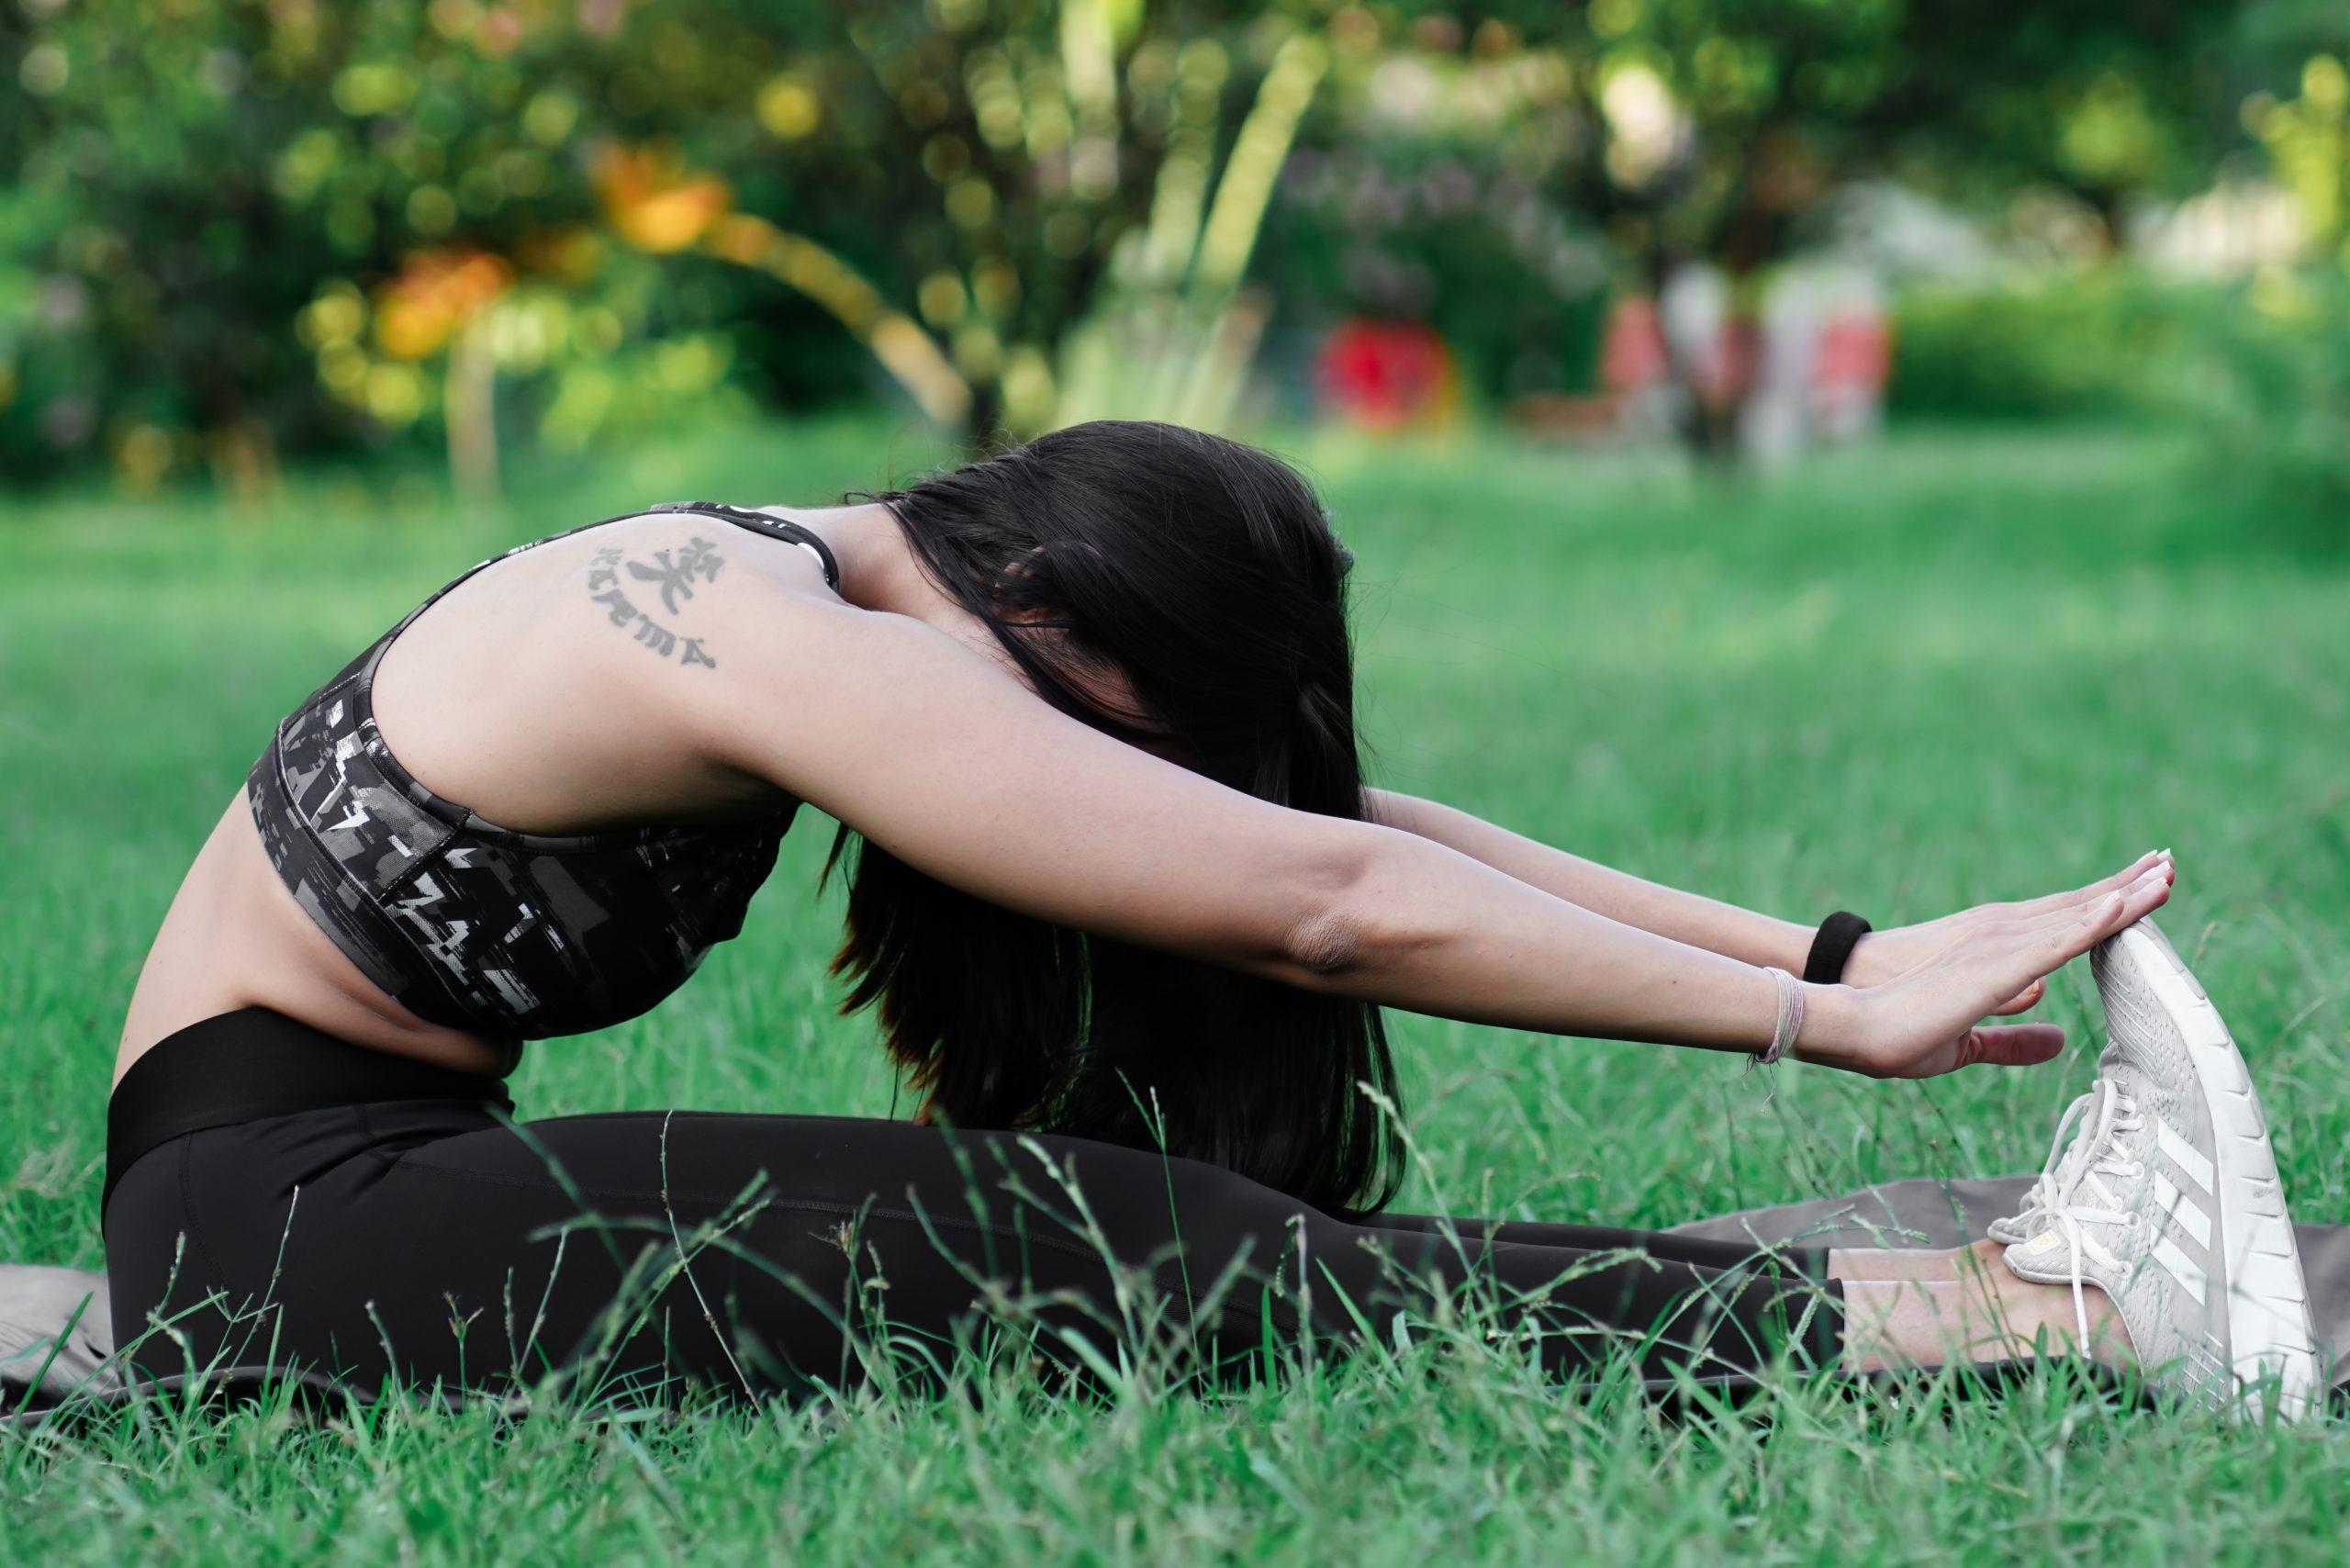 Fitness model do exercise in park area